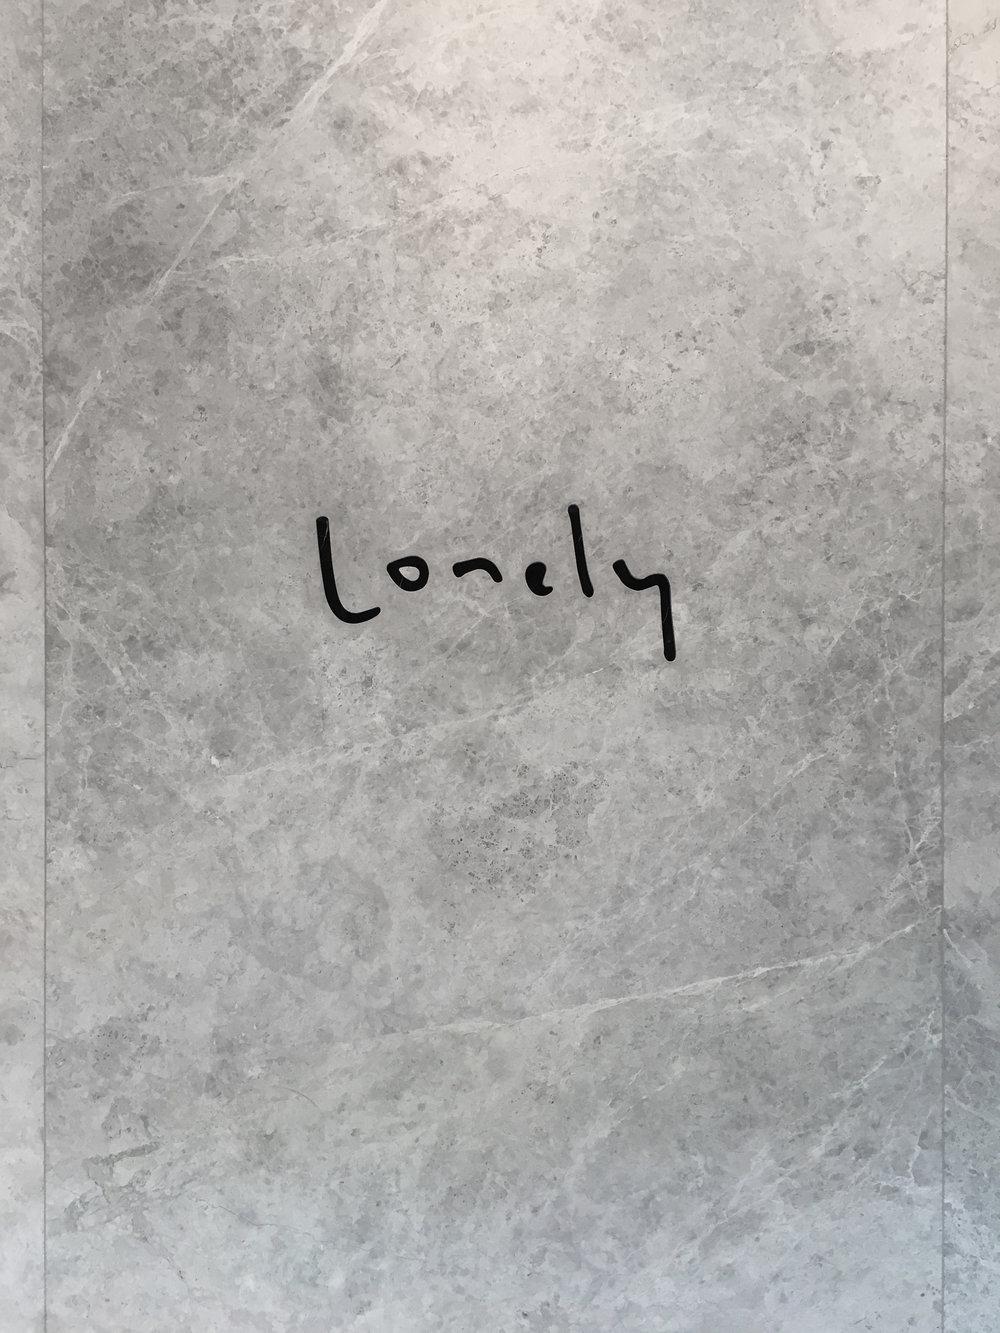 Lozidaz_Wellington_Lonely_01